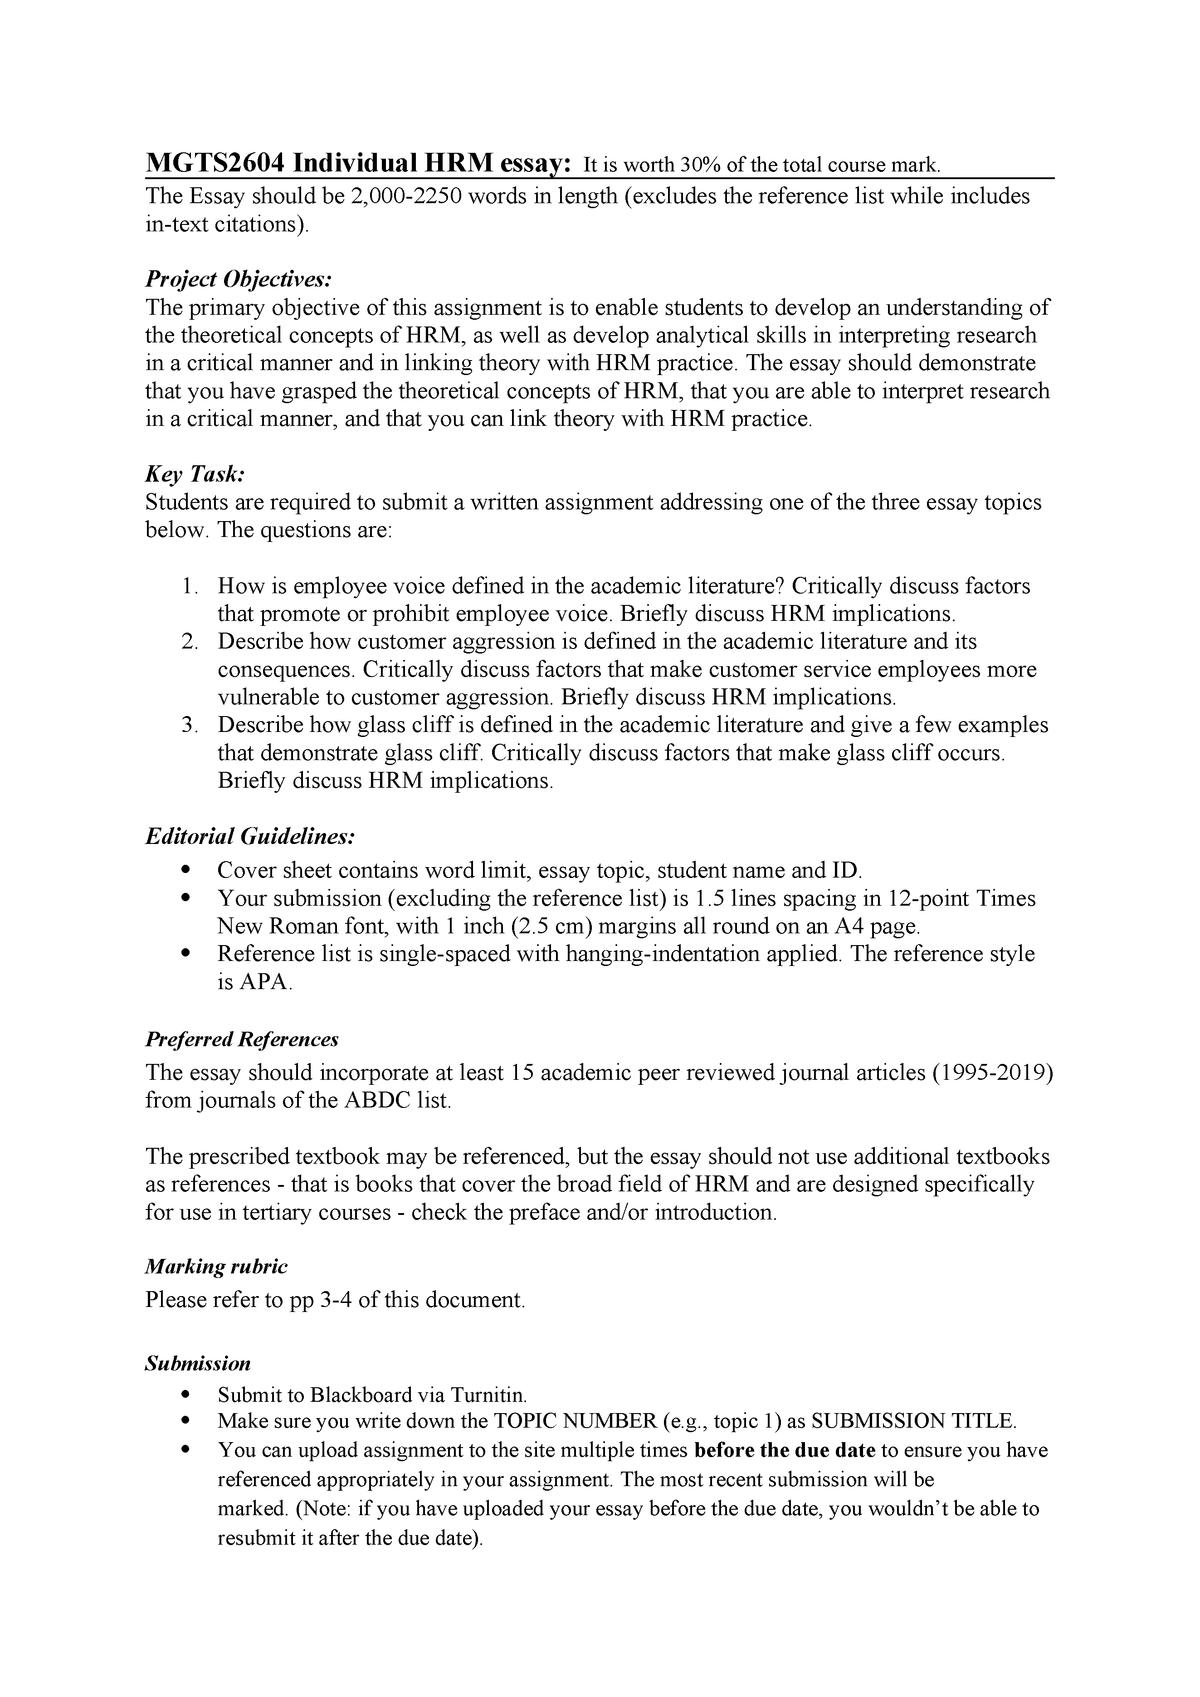 hrm essay mgts hrm essay task description and marking rubric